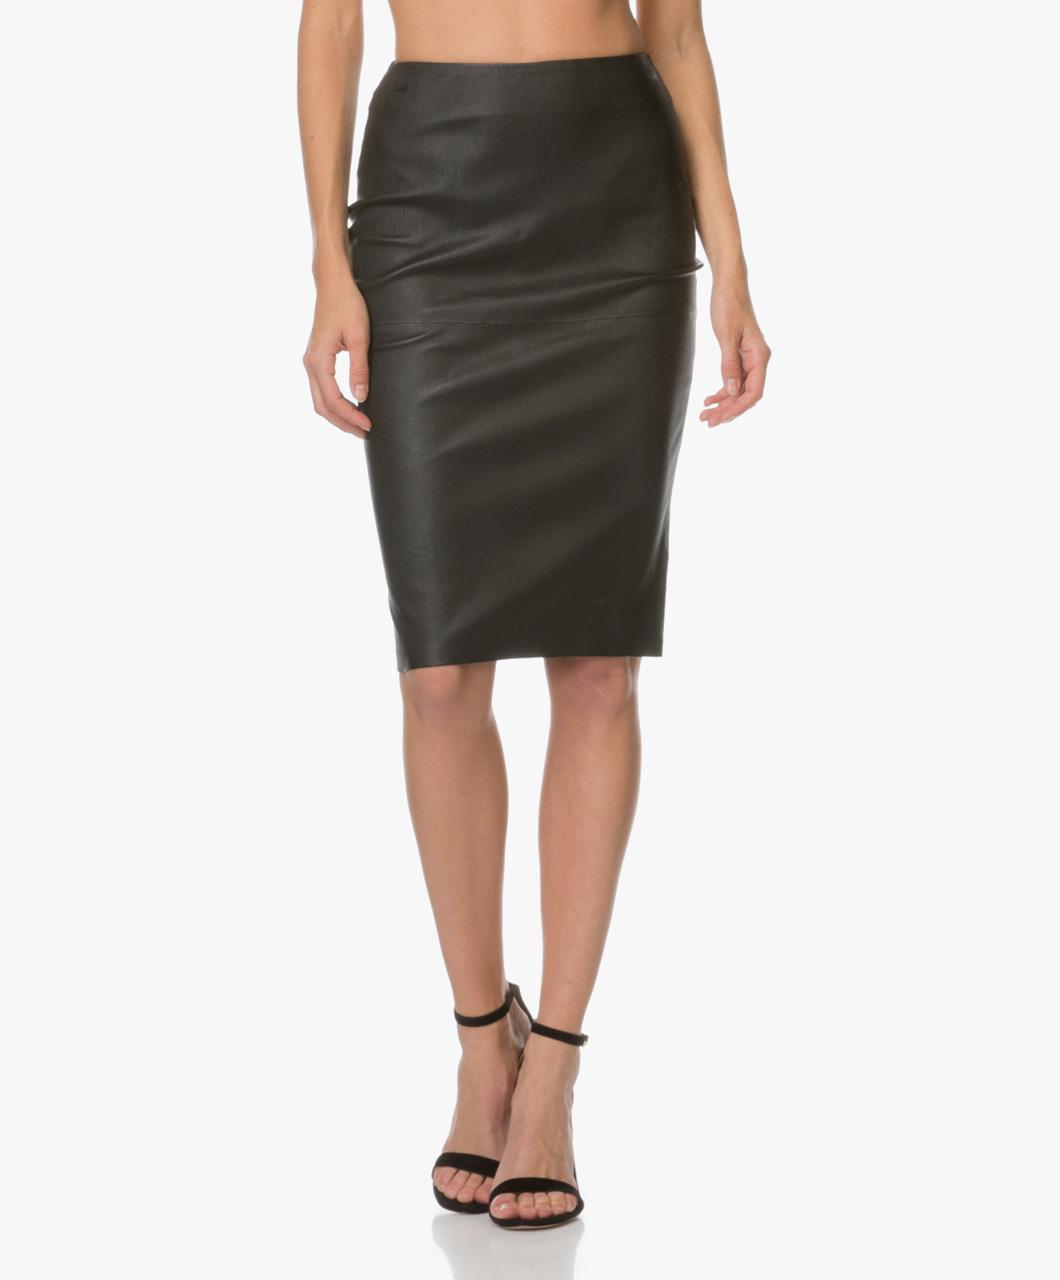 0db4248986 By Malene Birger Floridia Leather Pencil Skirt - Black - floridia ...